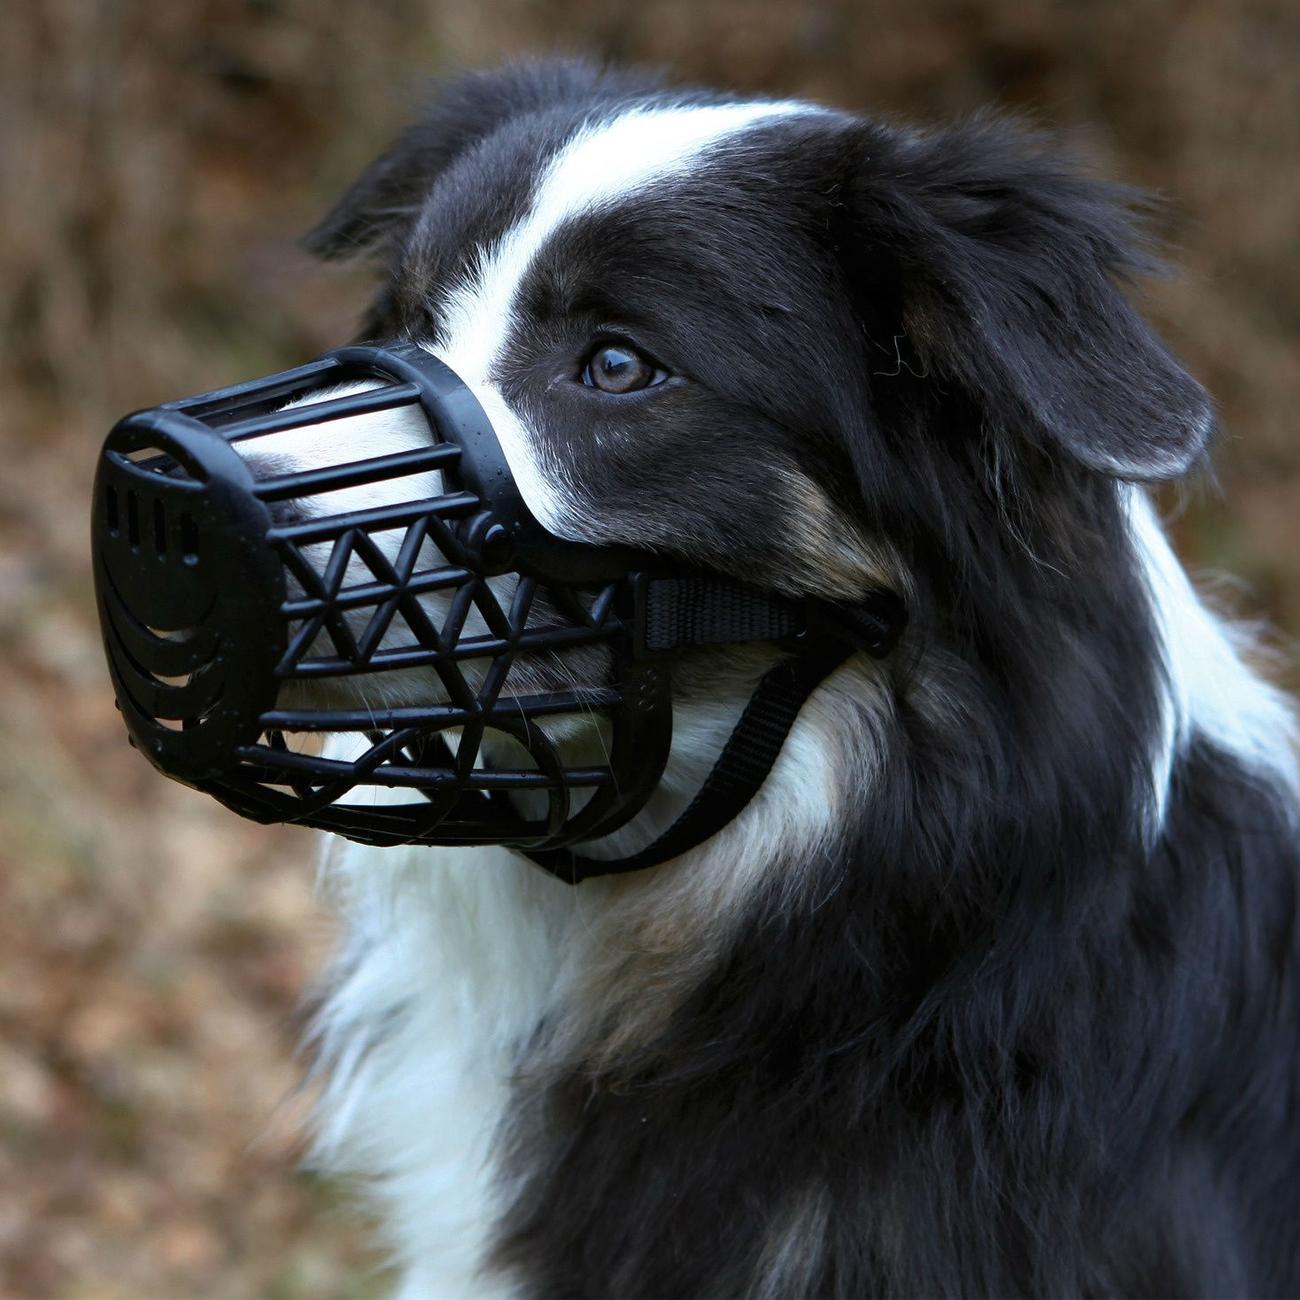 Trixie Maulkorb für Hunde aus Kunststoff 17601, Bild 2